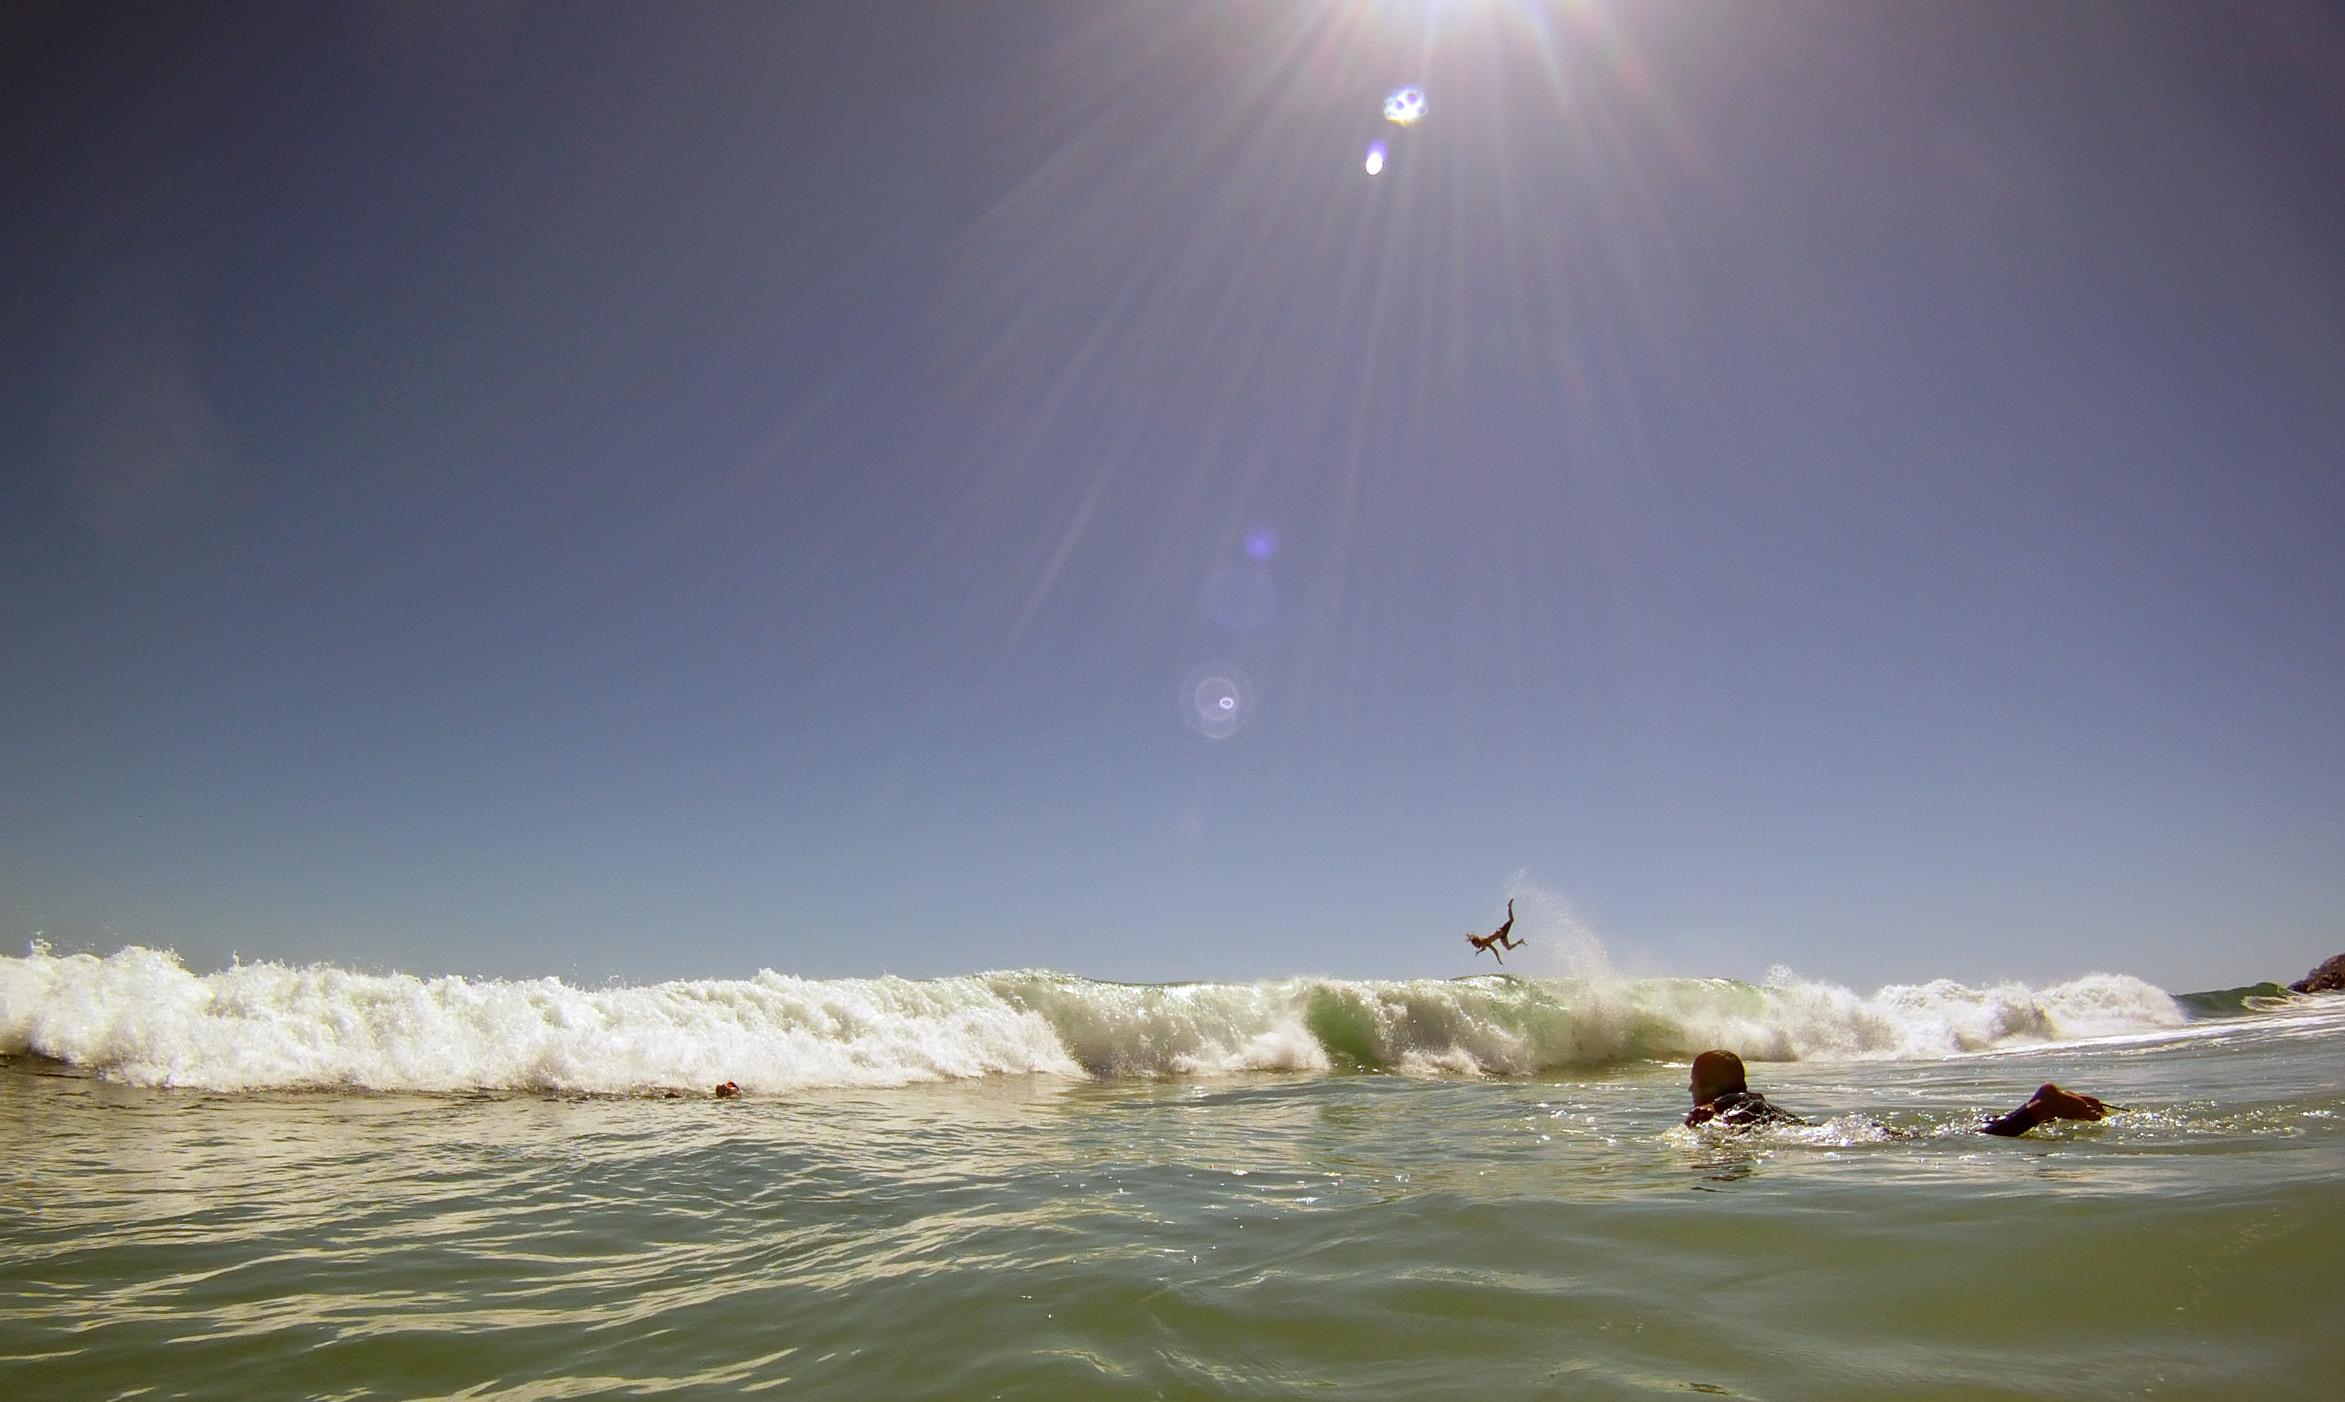 surfer-bail